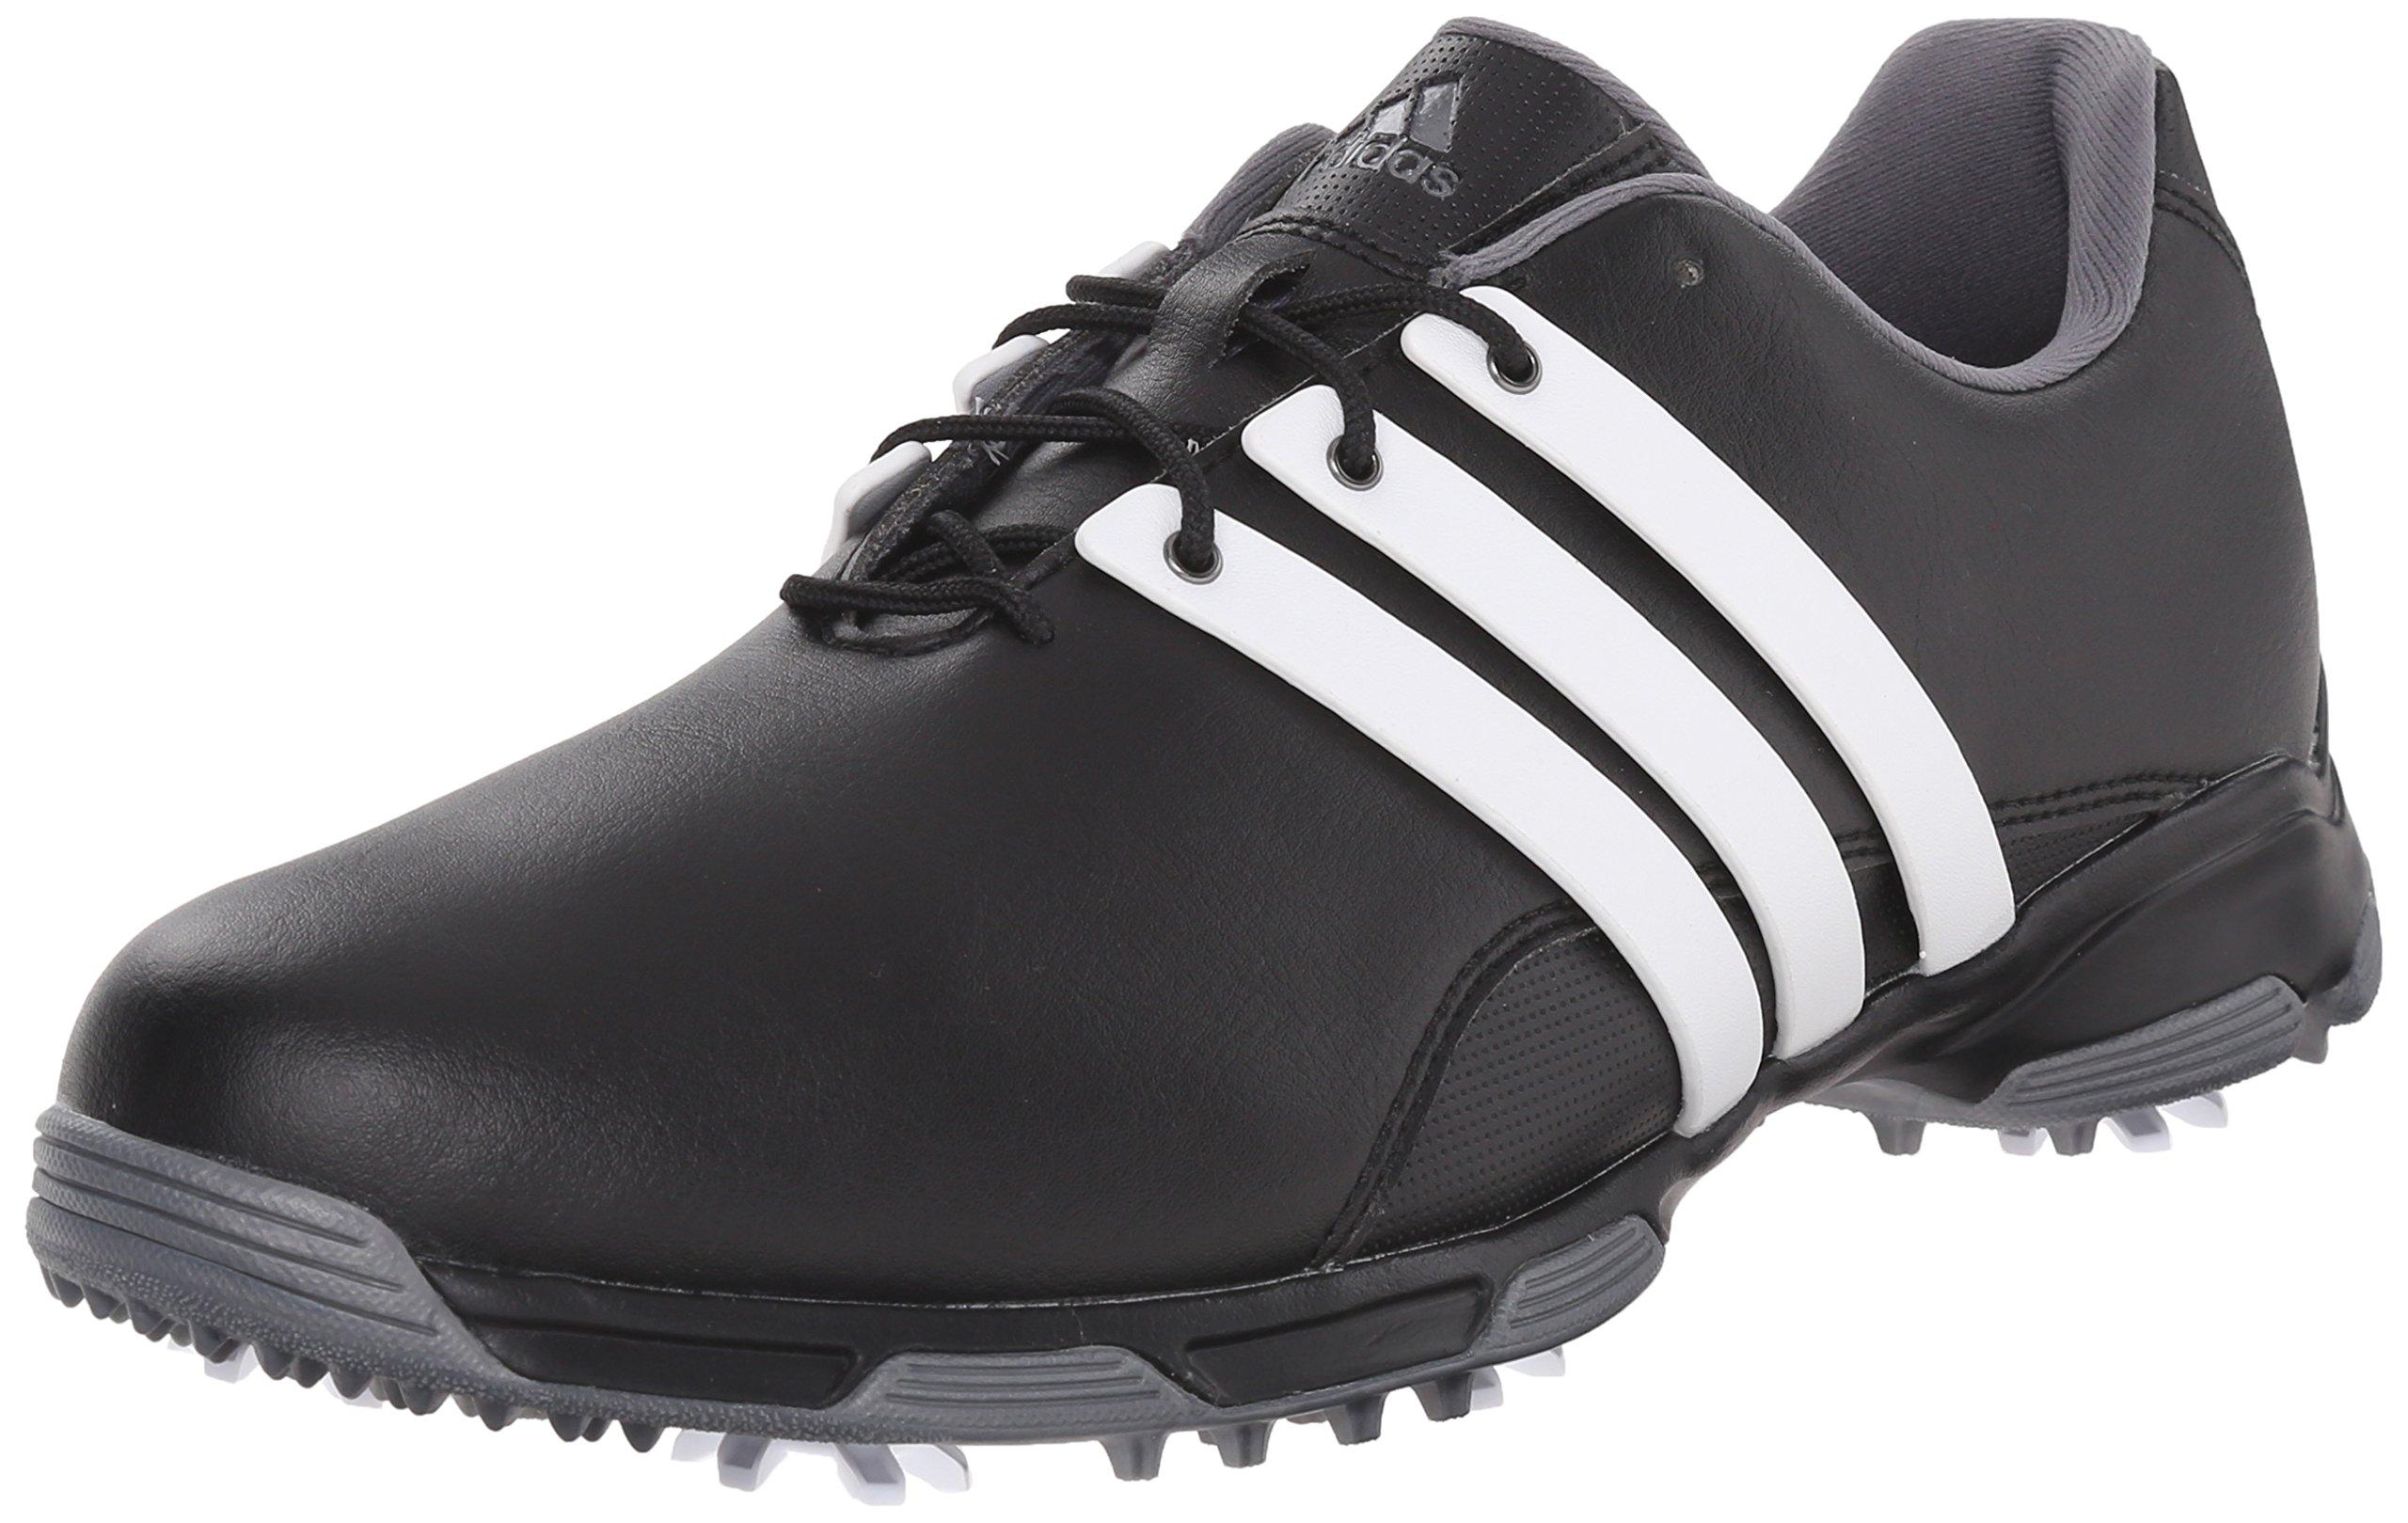 adidas Men's Pure TRX Golf Shoe, Black/FTWR White/Dark Silver Metallics, 10.5 M US